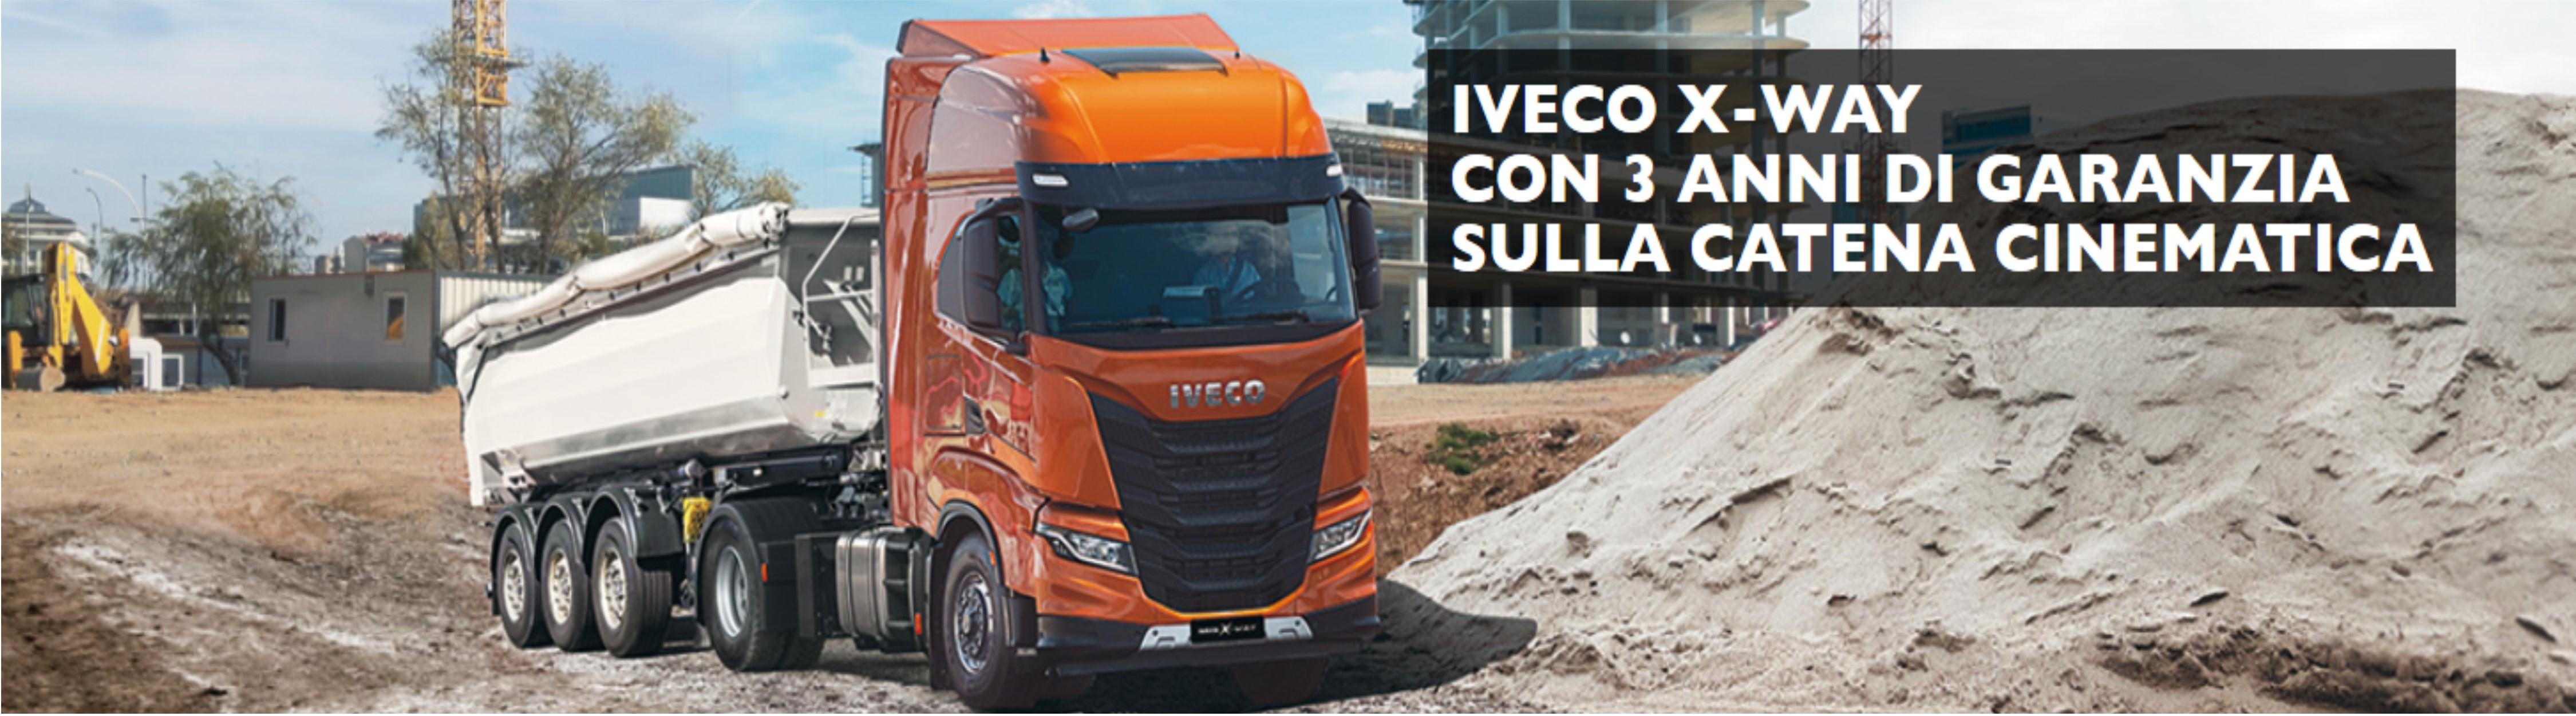 "Iveco X-Way trattore: il ""Perfect Crossing"""